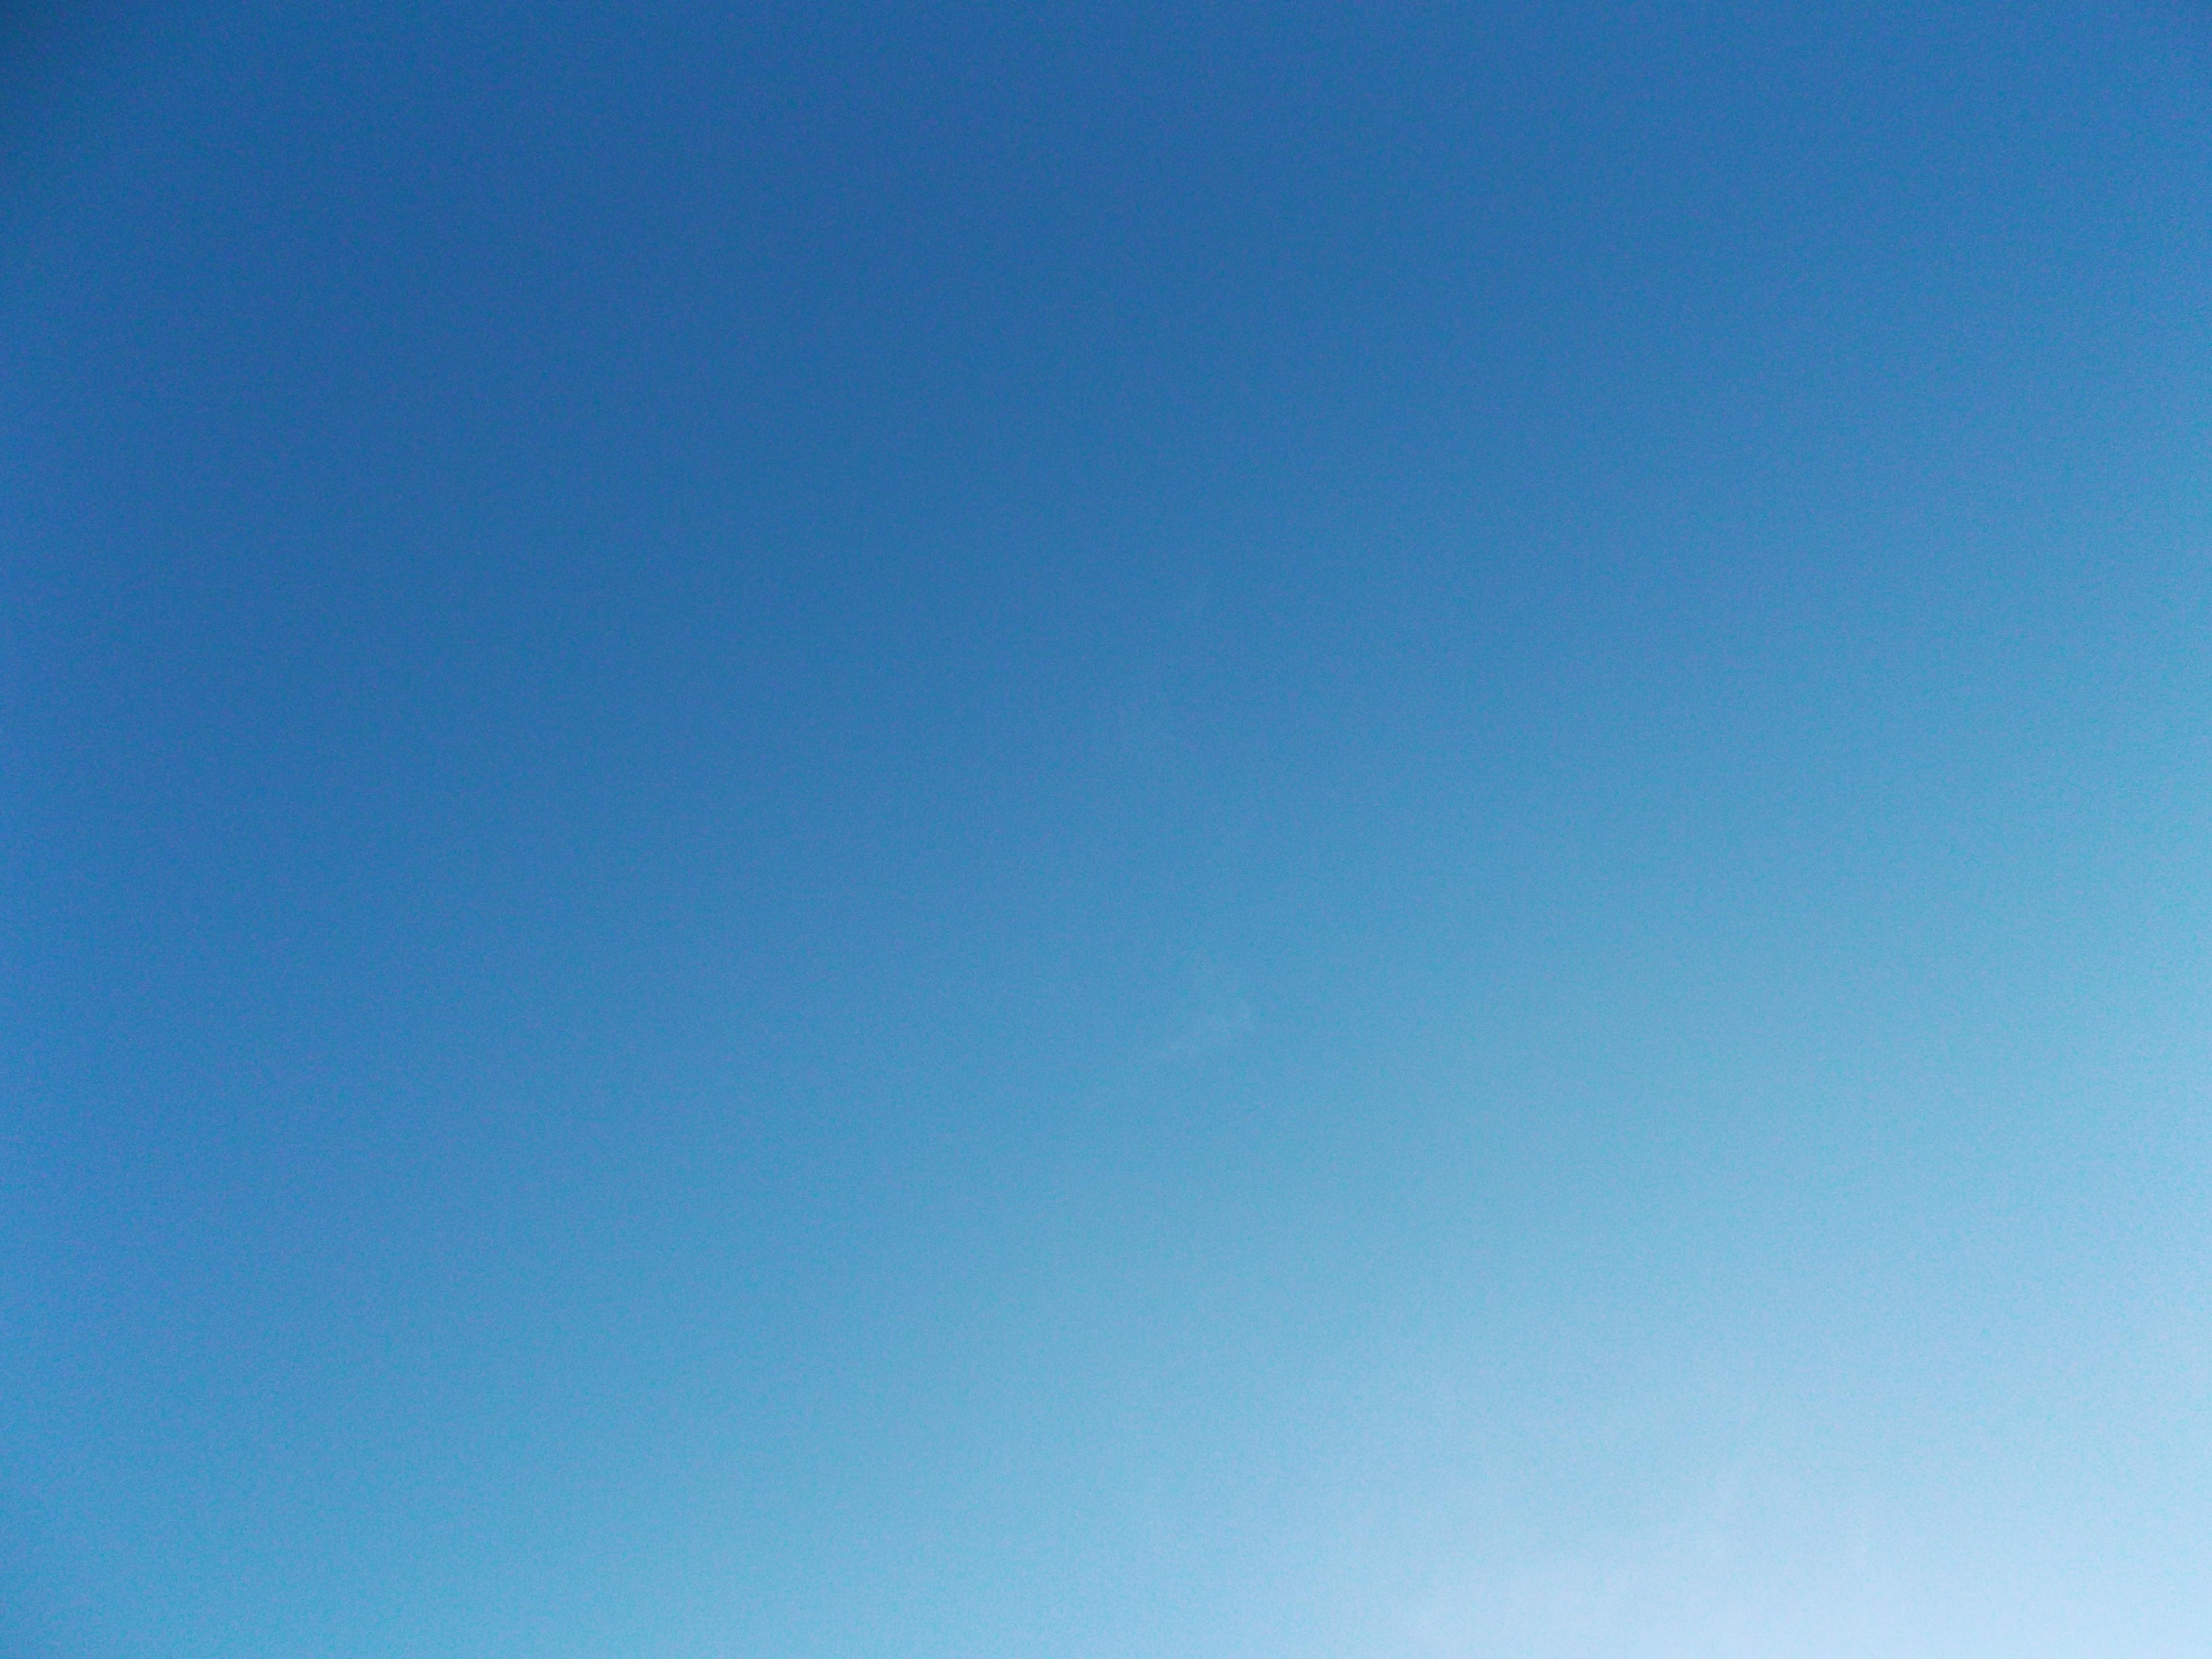 2013-04-29 Longitude -0.371 Latitude 49.182 Altitude 29 Heure 18h51